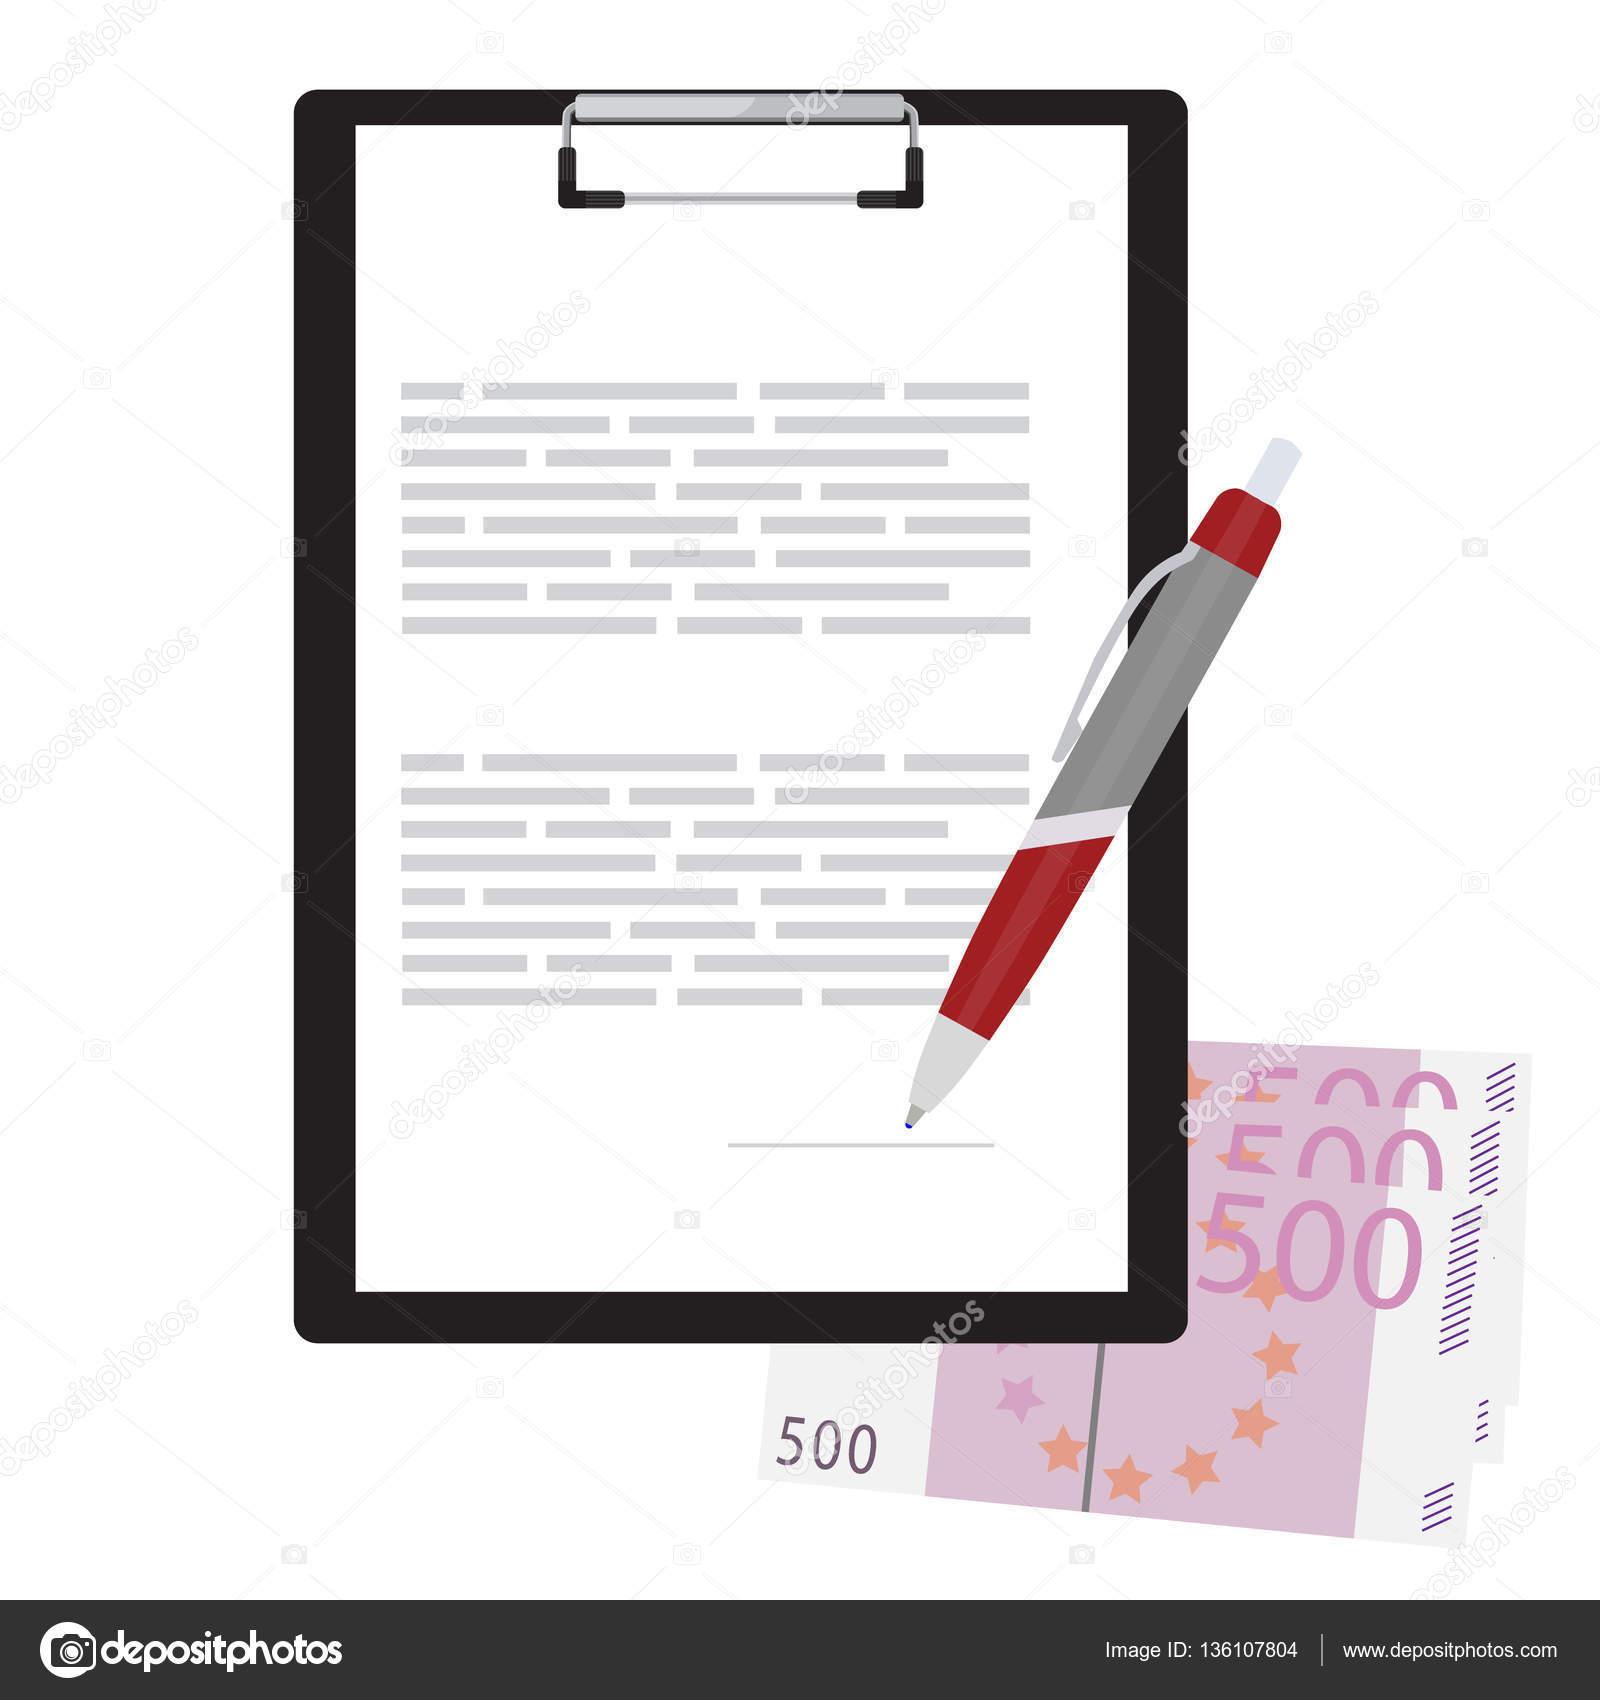 Dokument Vorlage Raster Stockfoto Viktorijareut 136107804